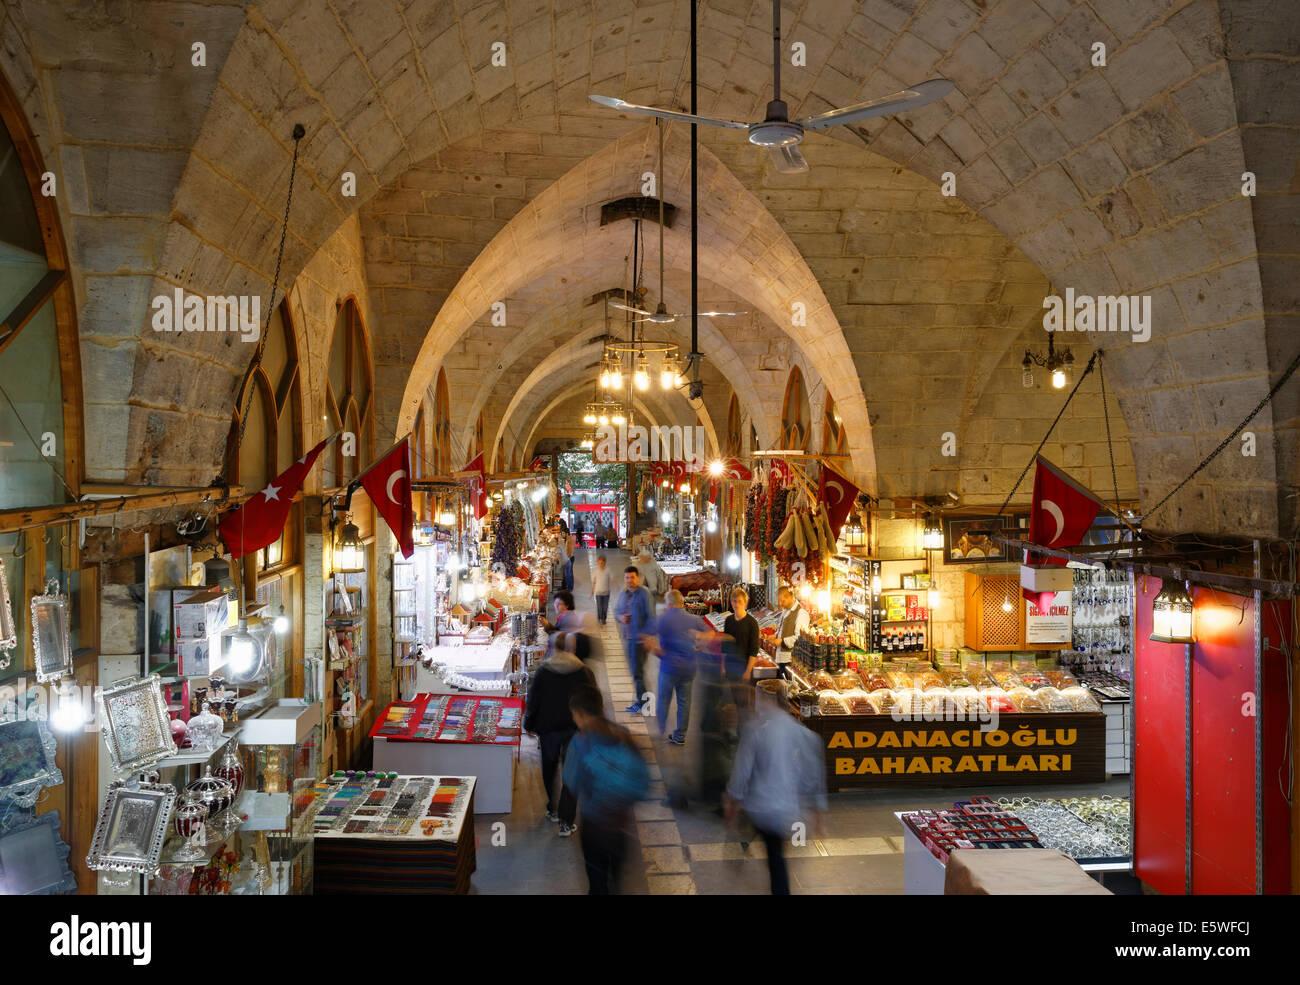 Bazaar, Bazaar District, Gaziantep, Southeastern Anatolia Region, Anatolia, Turkey - Stock Image